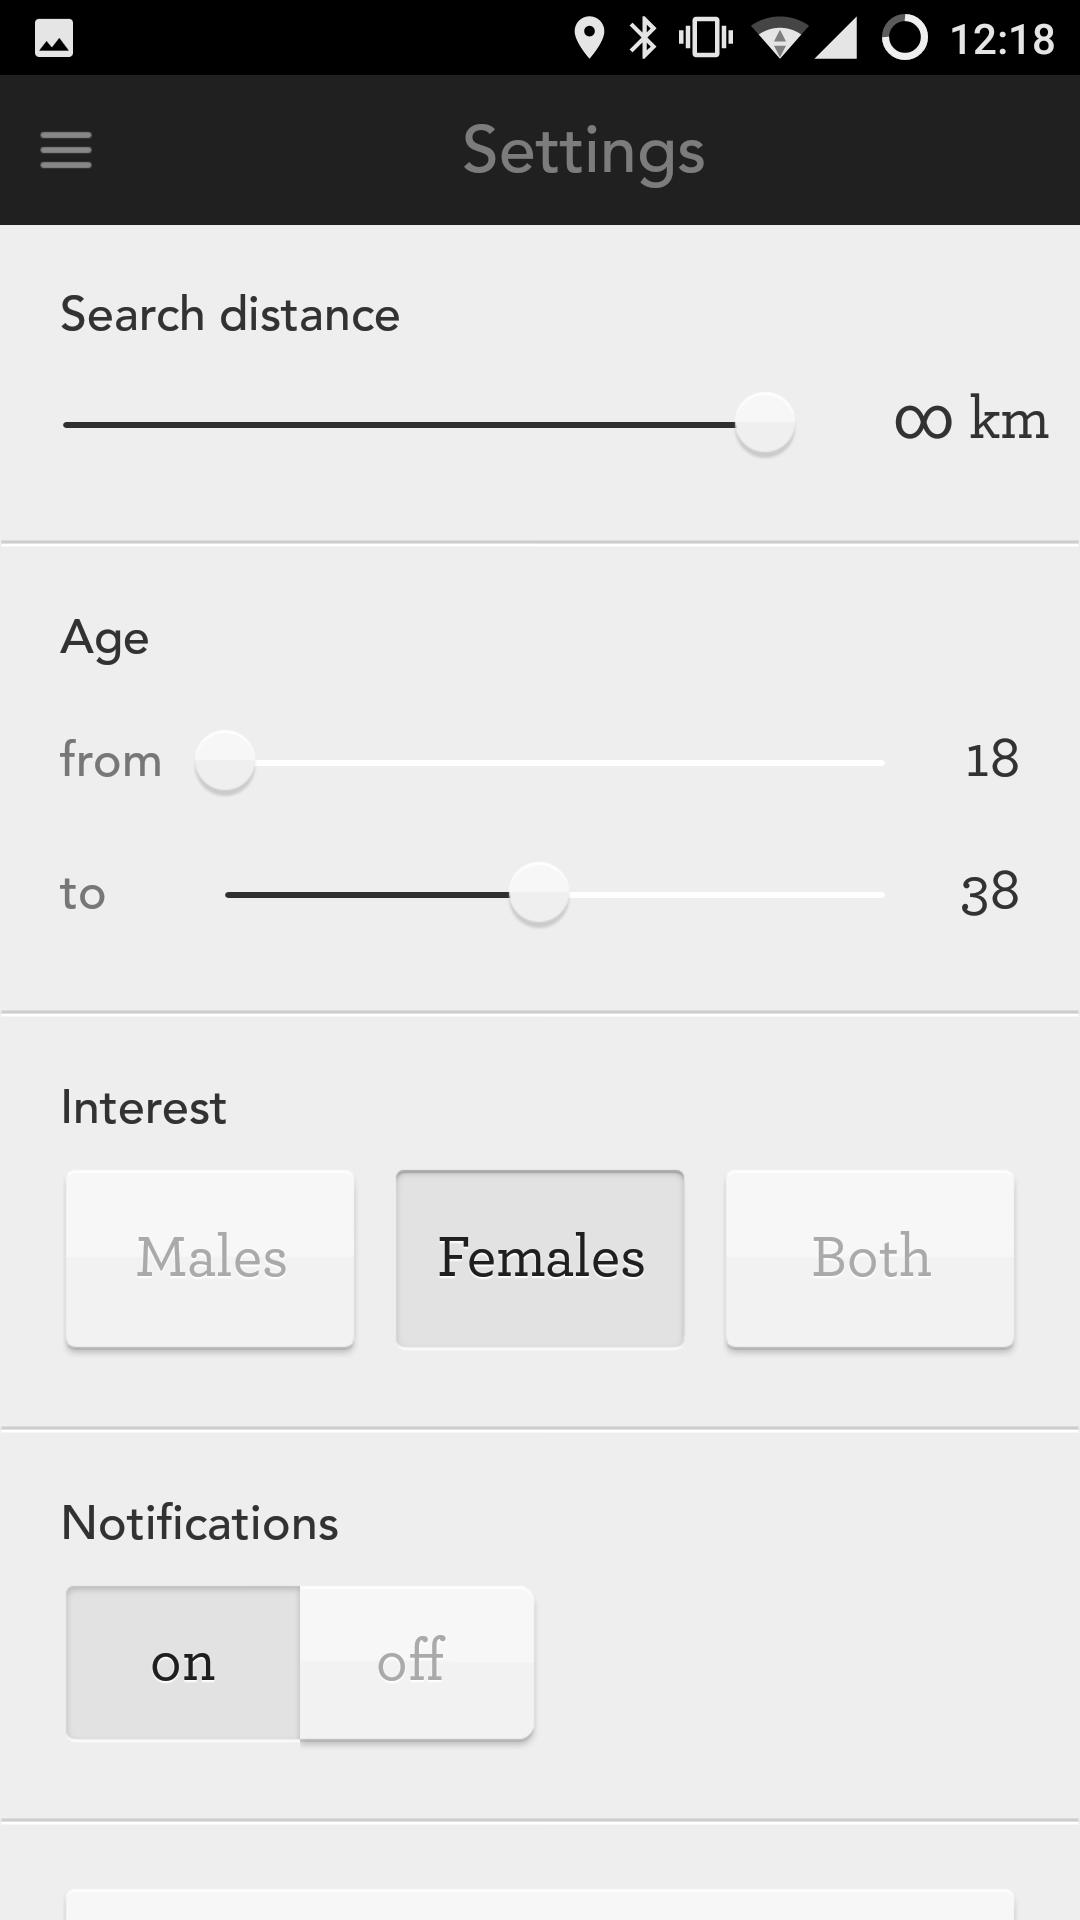 programmi televisivi hot app android incontri